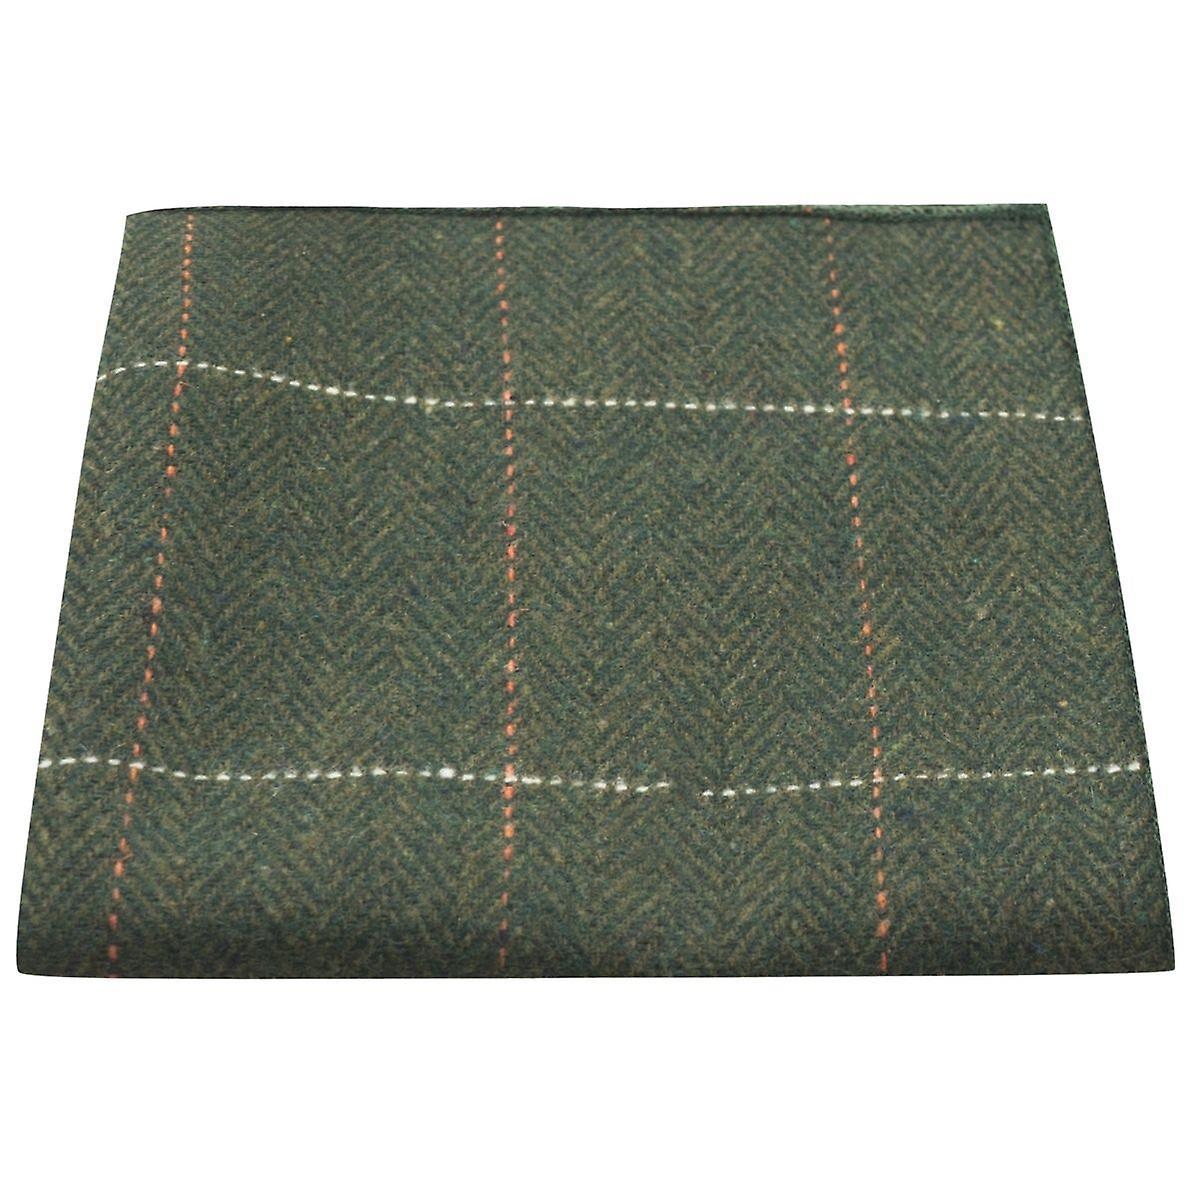 Luxury Herringbone Forest Green Tweed Pocket Square, Handkerchief